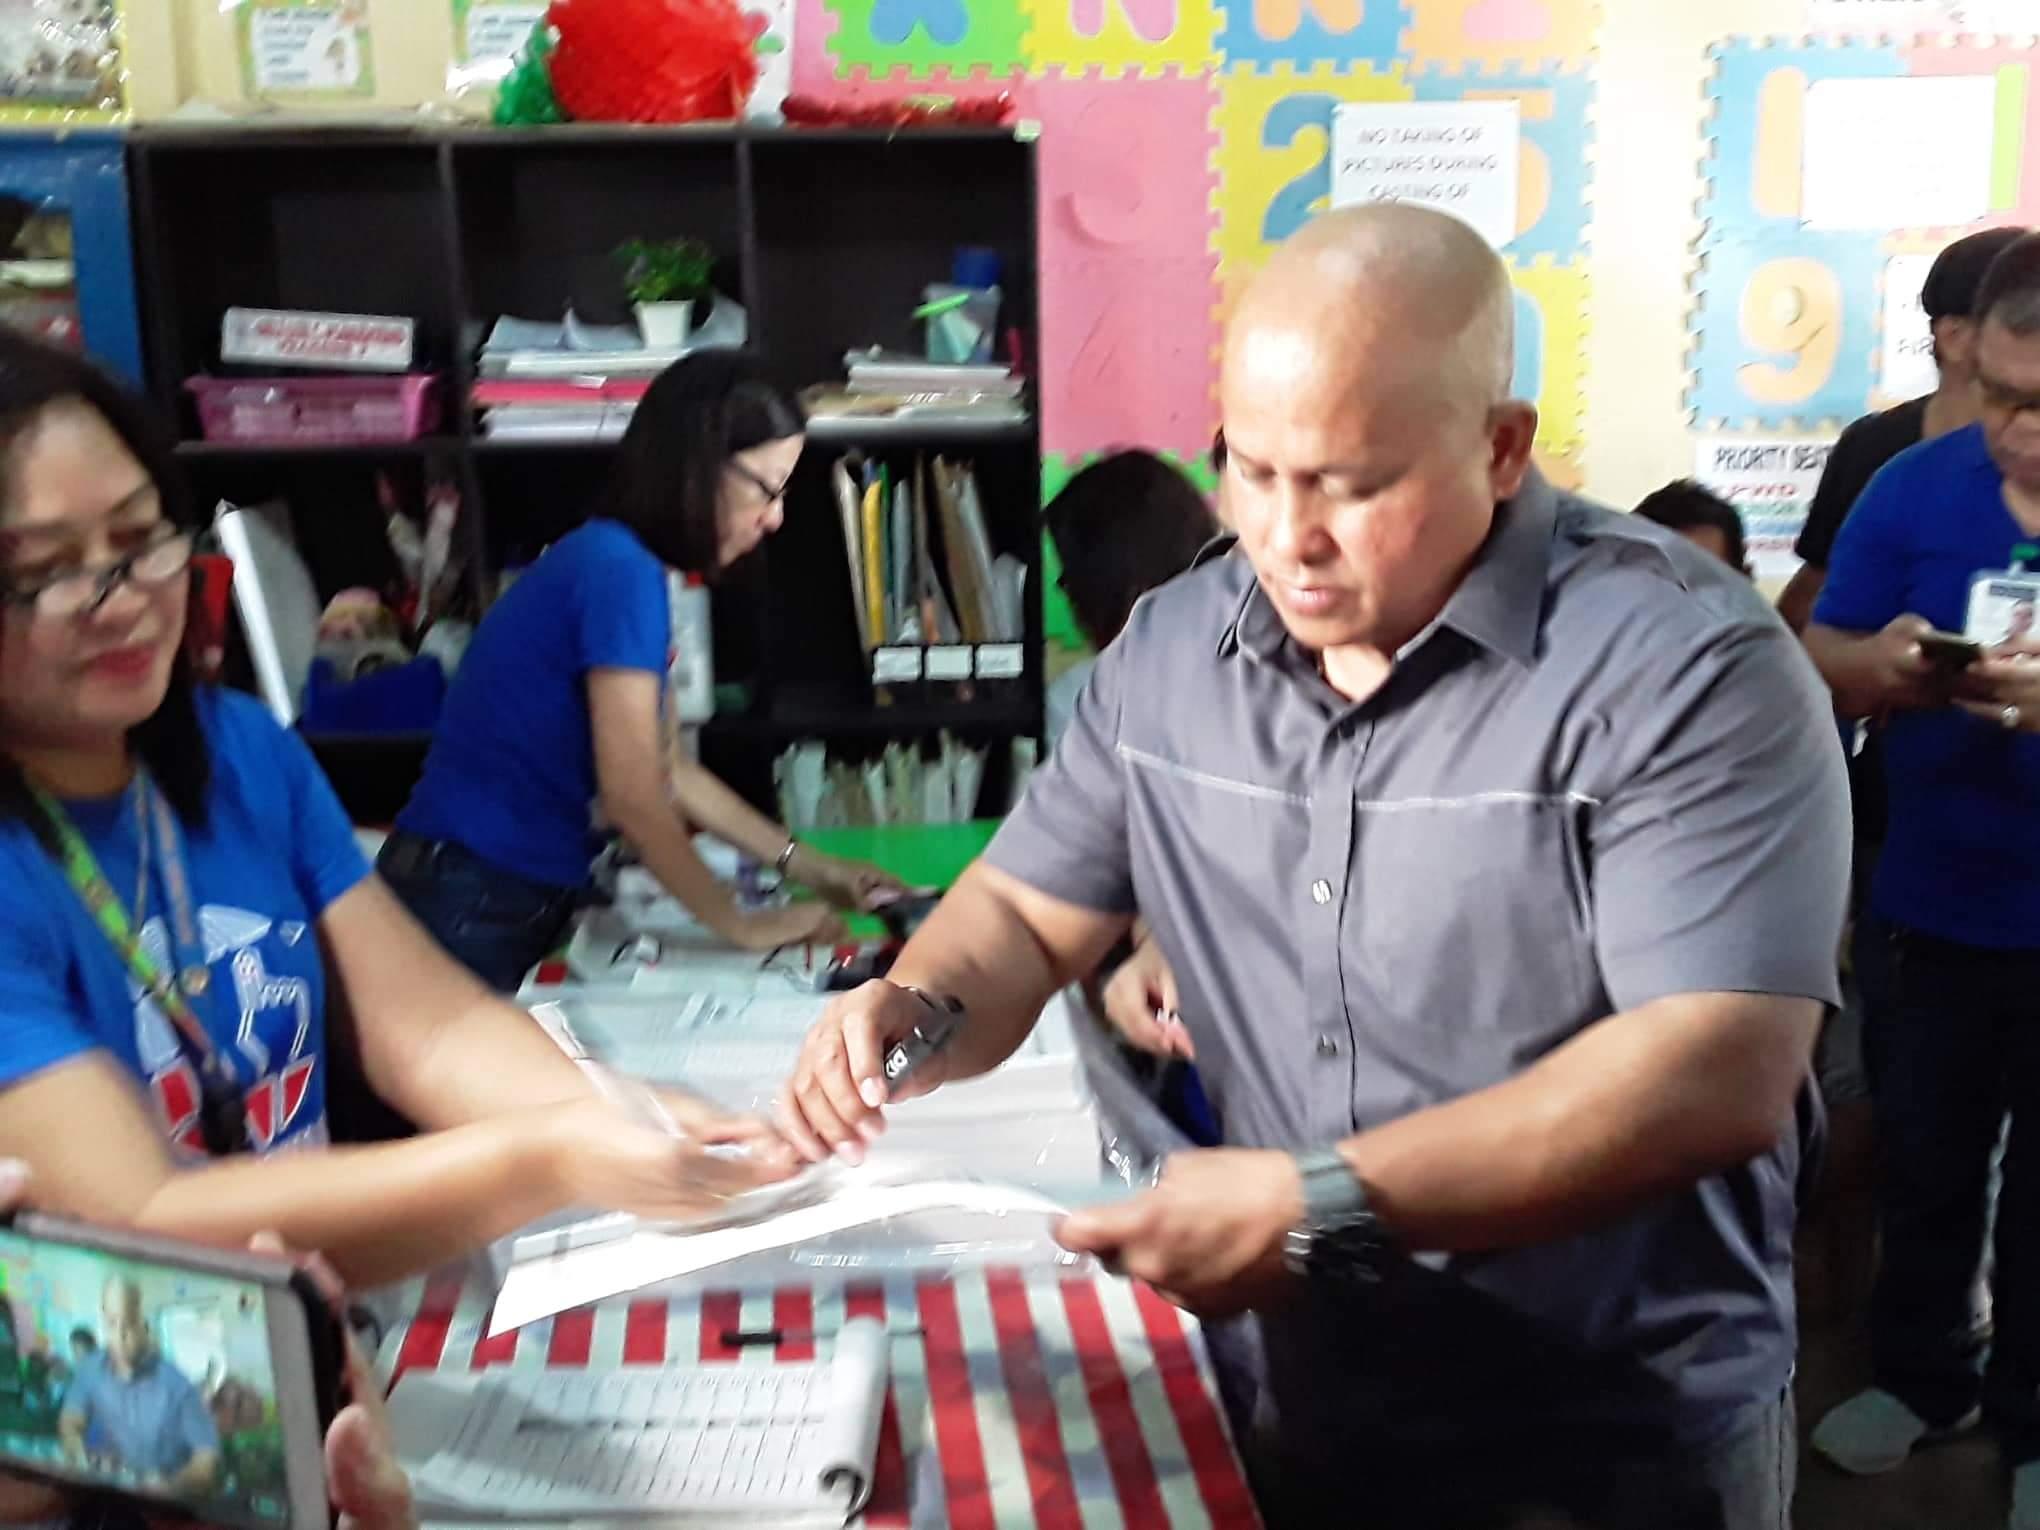 DAVAO DEL SUR. Former police chief and senatorial candidate Ronald Dela Rosa votes in his precinct in barangay Bato in Sta. Cruz, Davao Del Sur. Photo by Dolritz Ilego